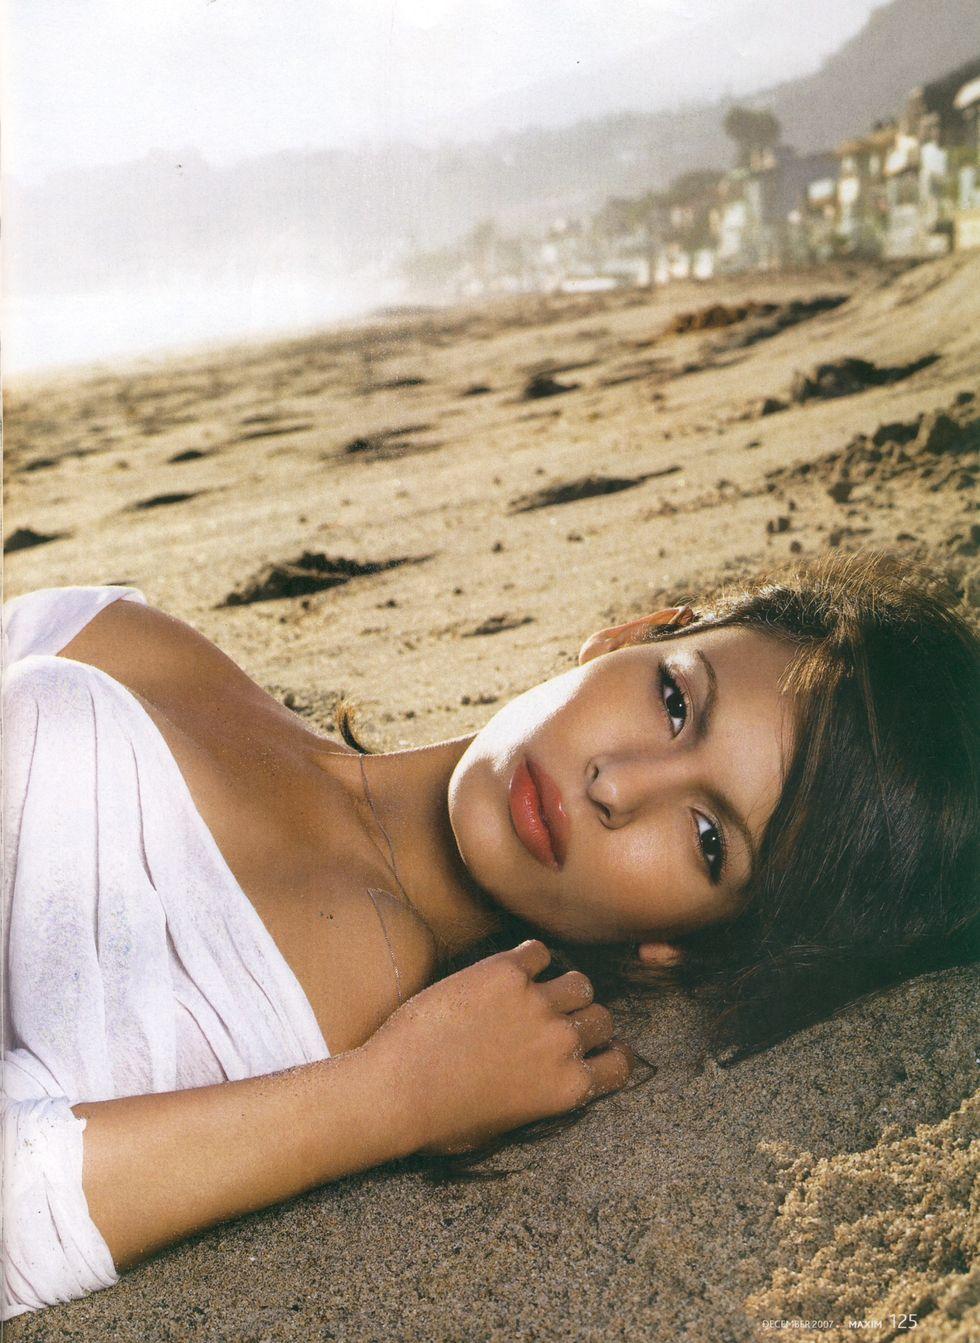 nadine-valezquez-maxim-magazine-december-2007-01